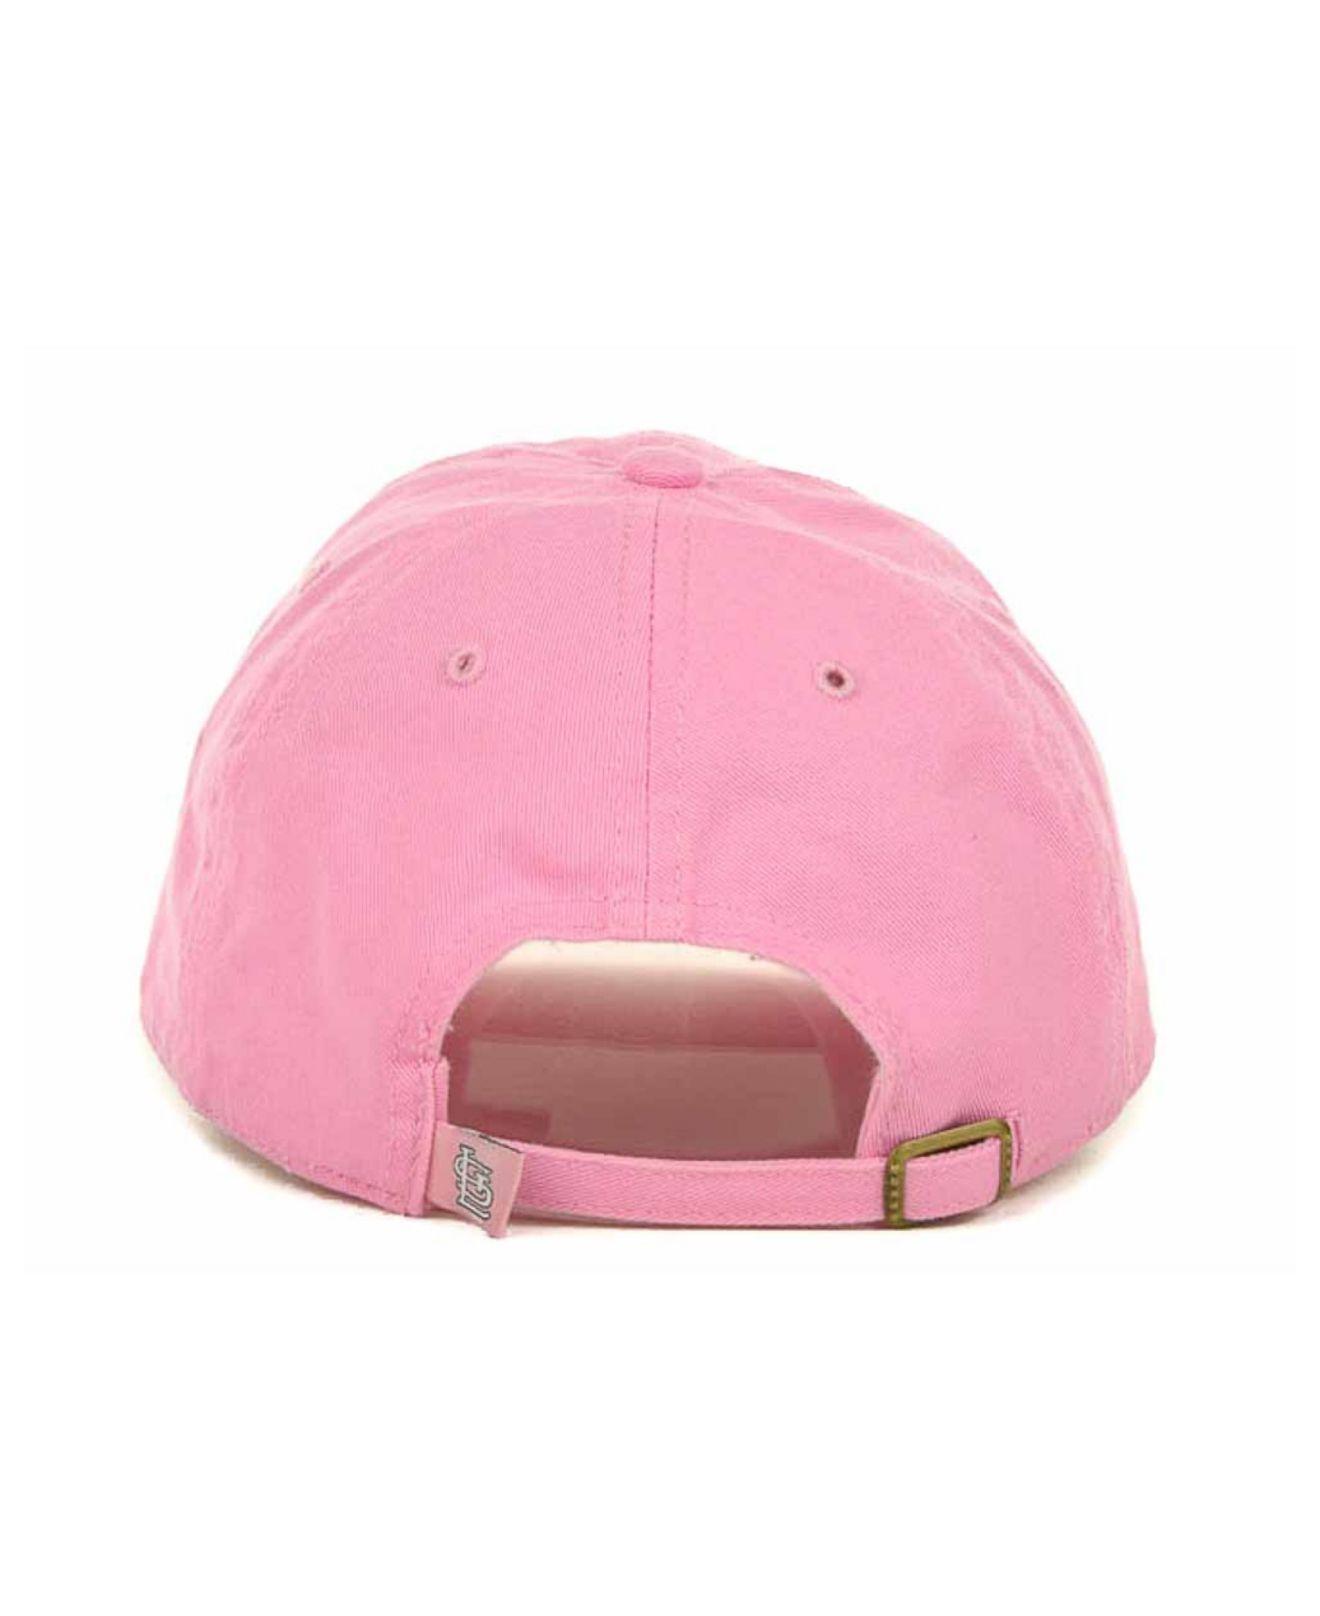 online store 75d89 e1d37 ... shopping lyst 47 brand kids st. louis cardinals clean up cap in pink  for men